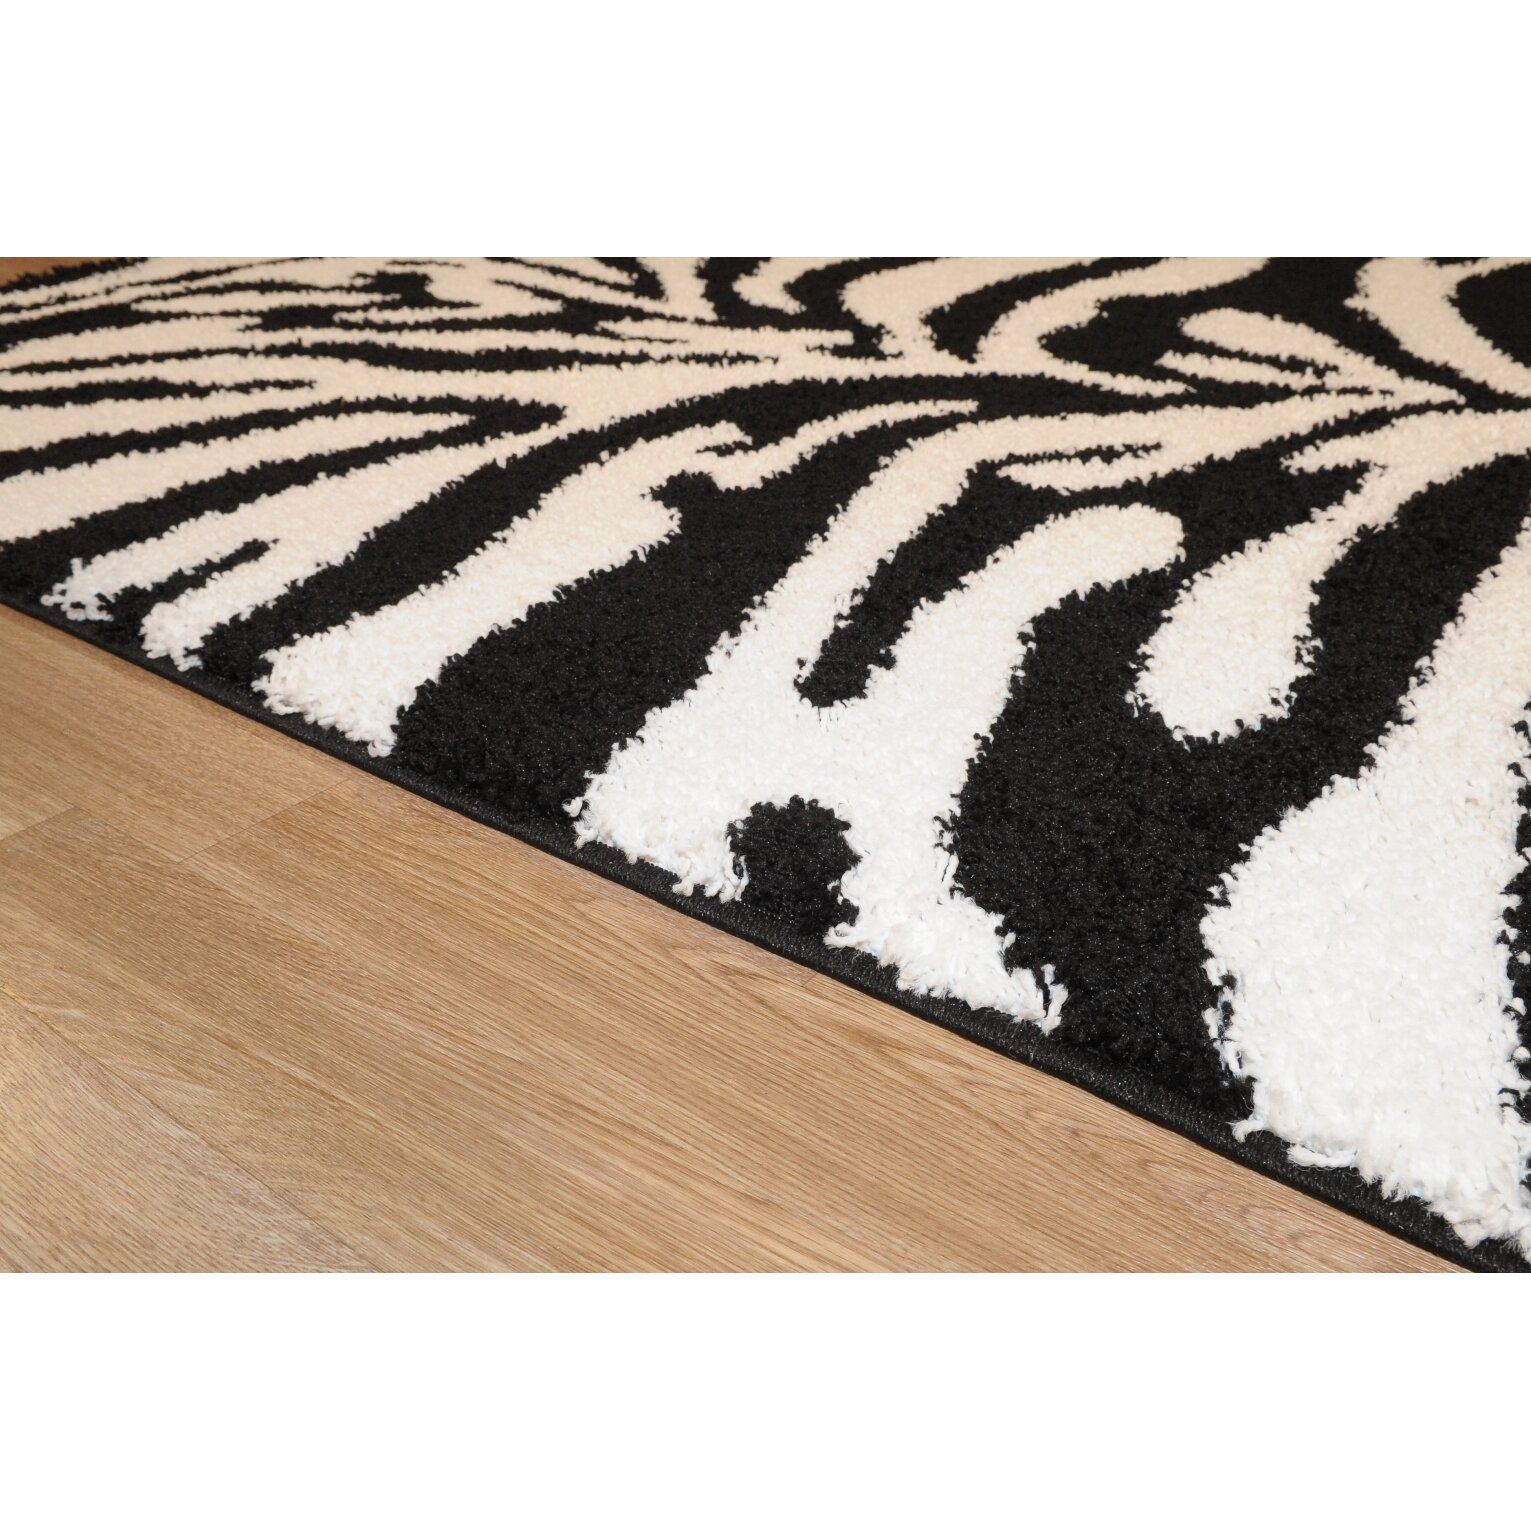 Rugnur bella zebra print black white shag area rug - Black and white rug ...